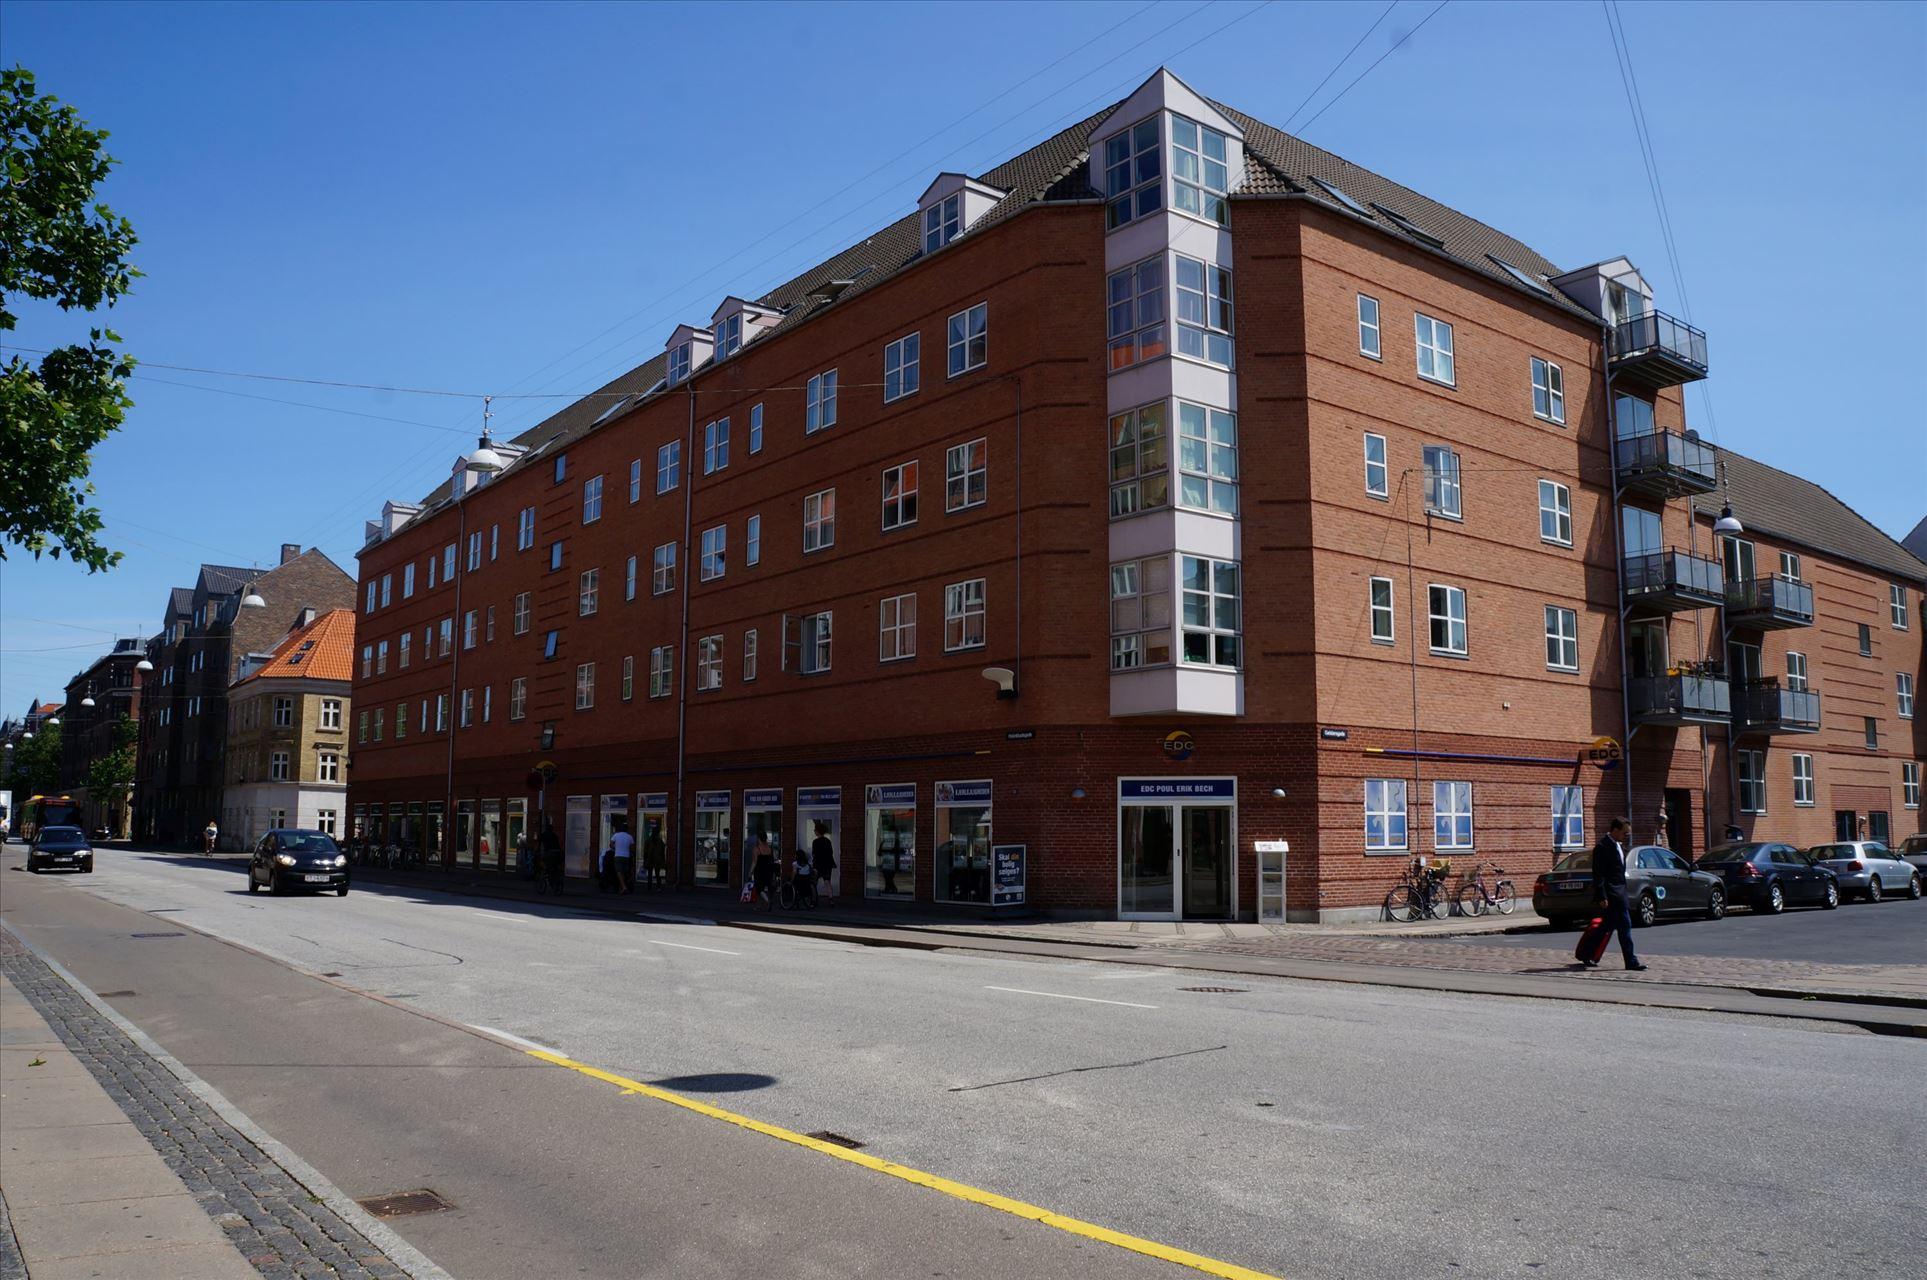 60 m² flotte kontorlokaler